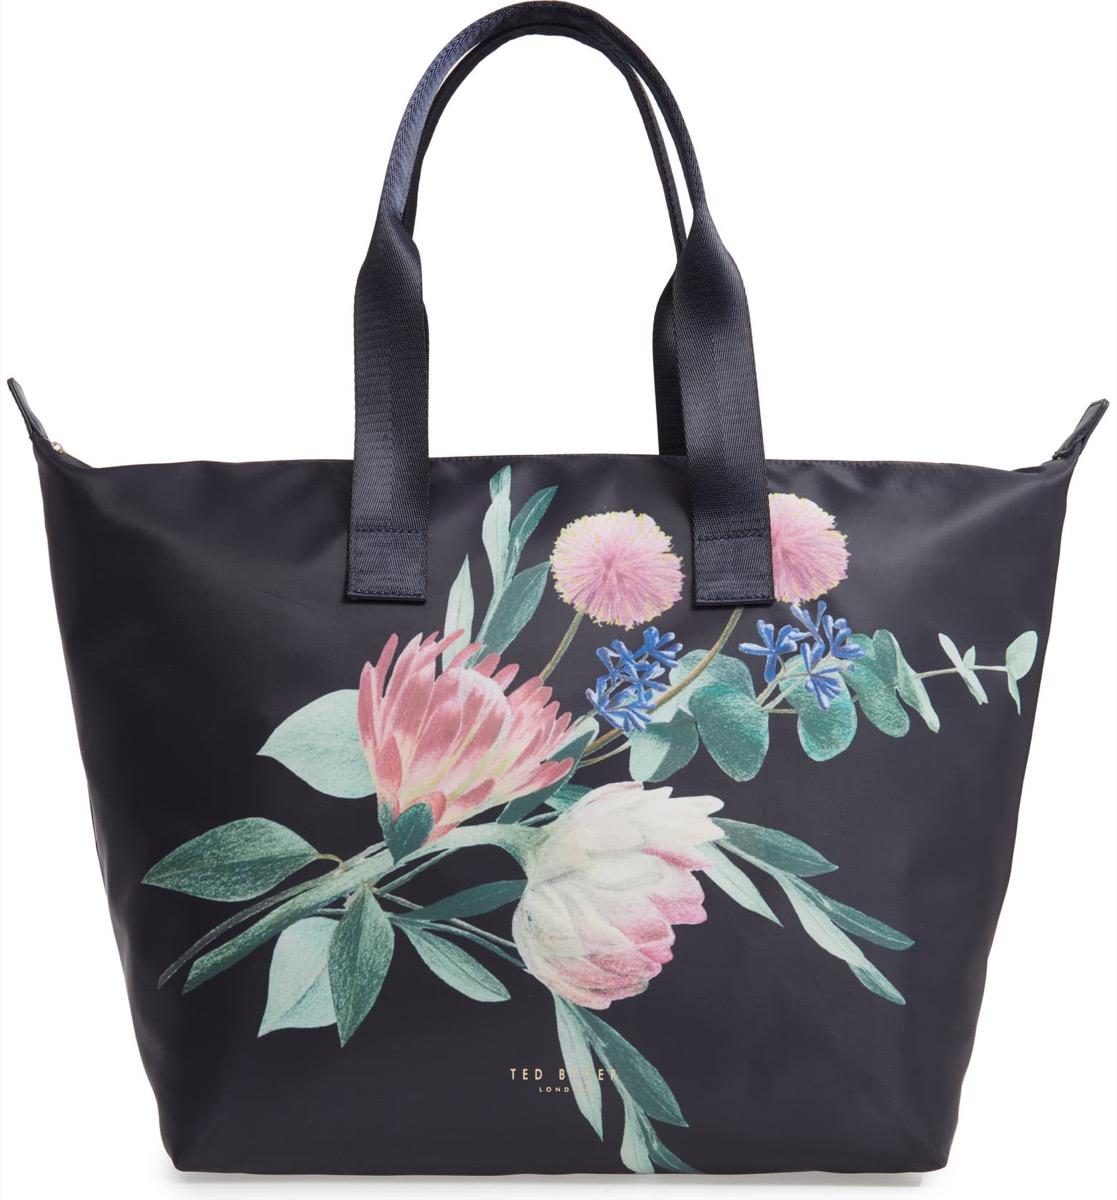 black floral tote, Nordstrom anniversary sale